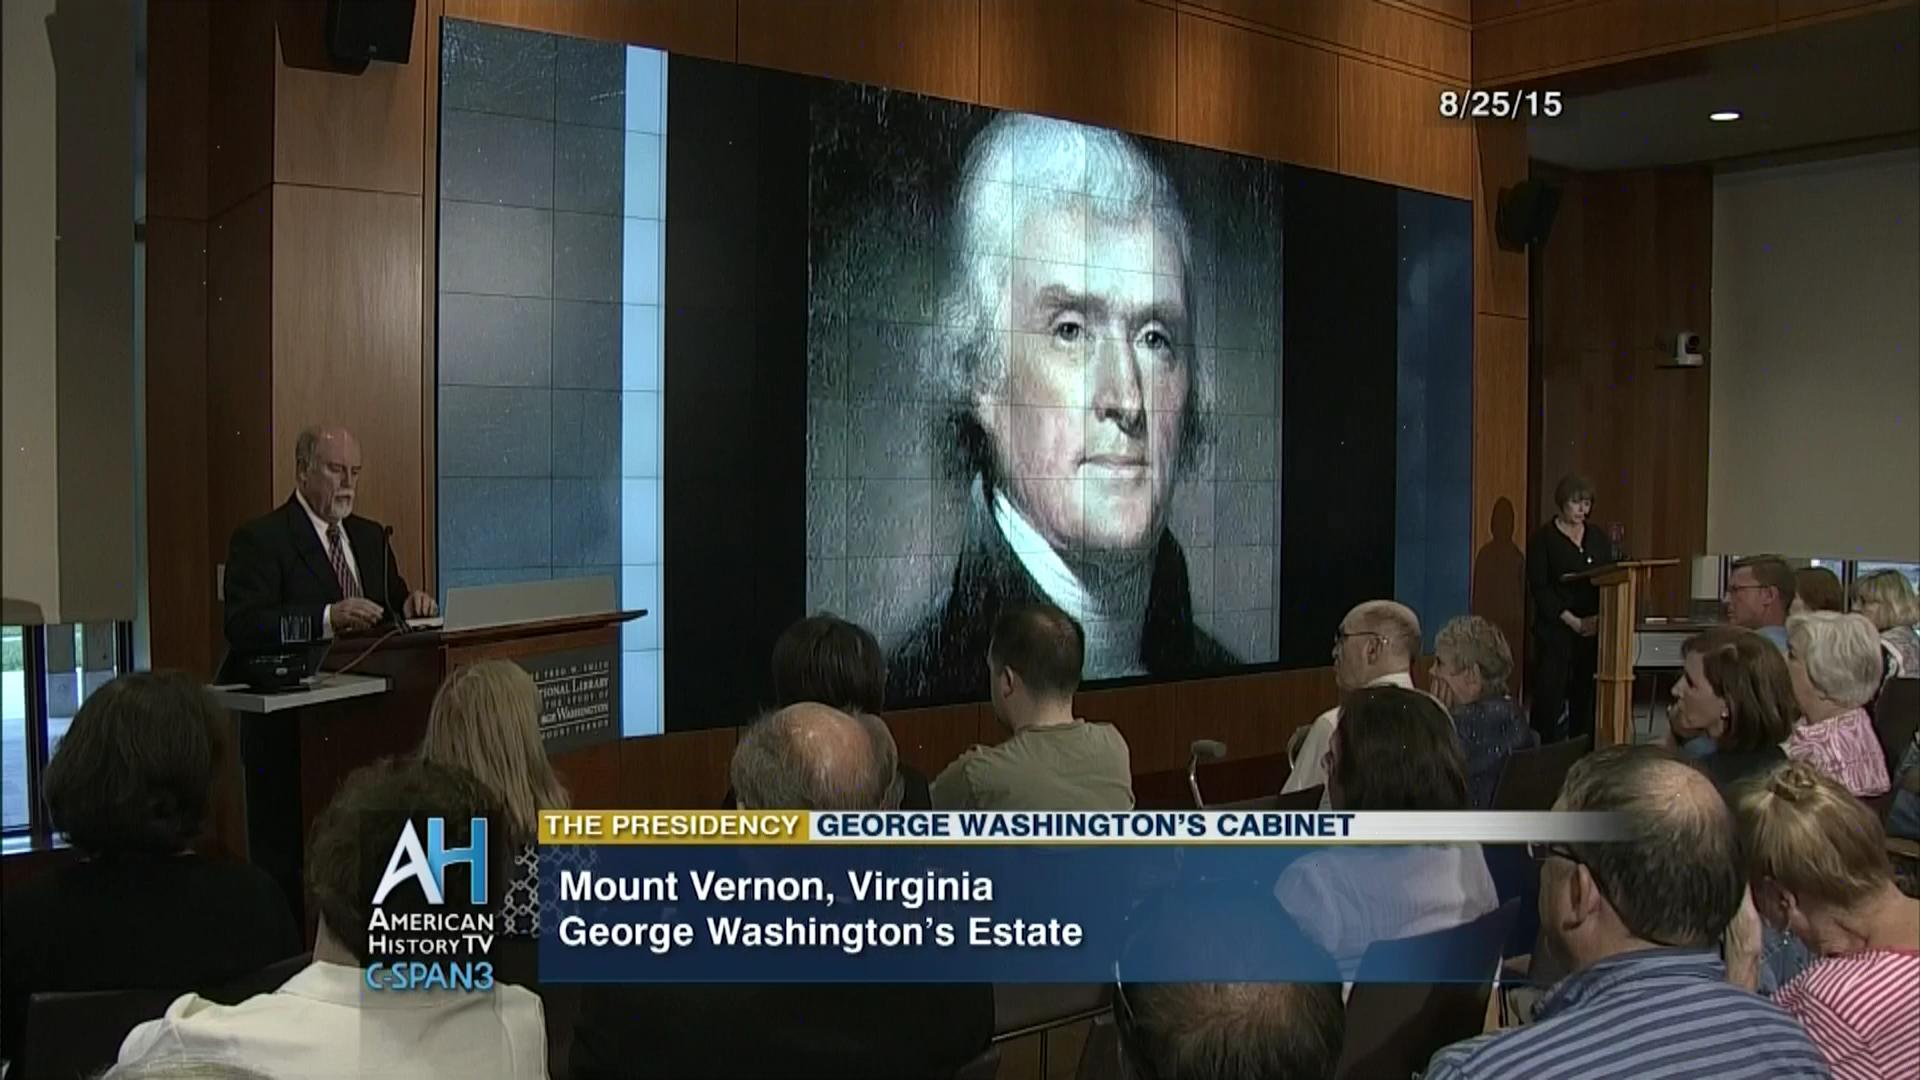 George Washingtonu0027s Cabinet, Aug 25 2015 | Video | C SPAN.org